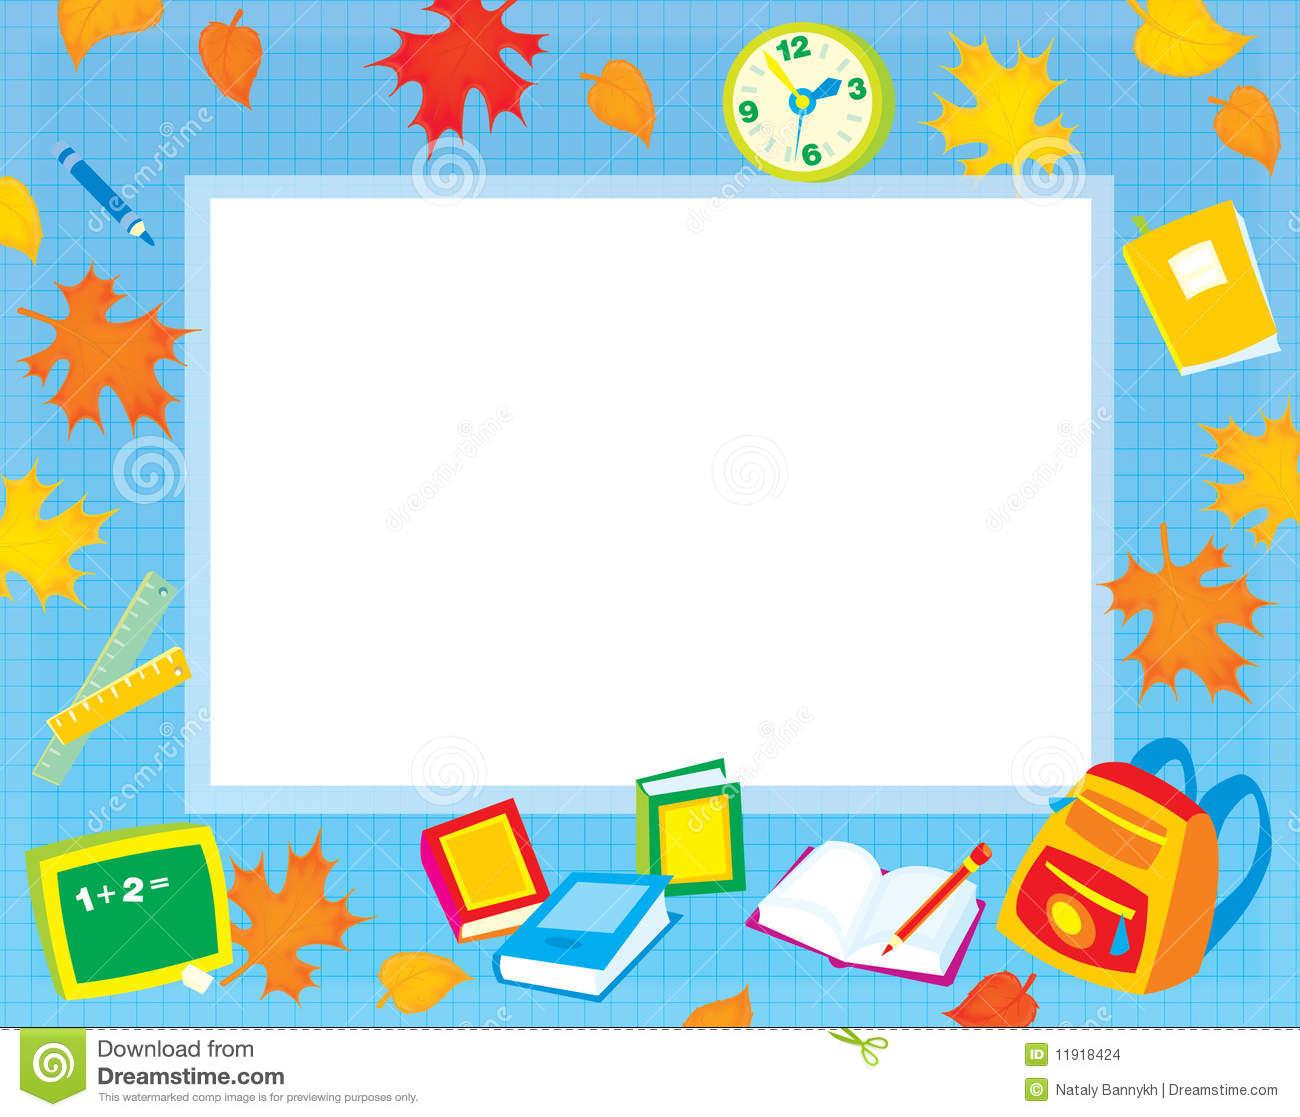 Jpeg school boarder clipart jpg freeuse download Jpeg school border clipart - ClipartFest jpg freeuse download